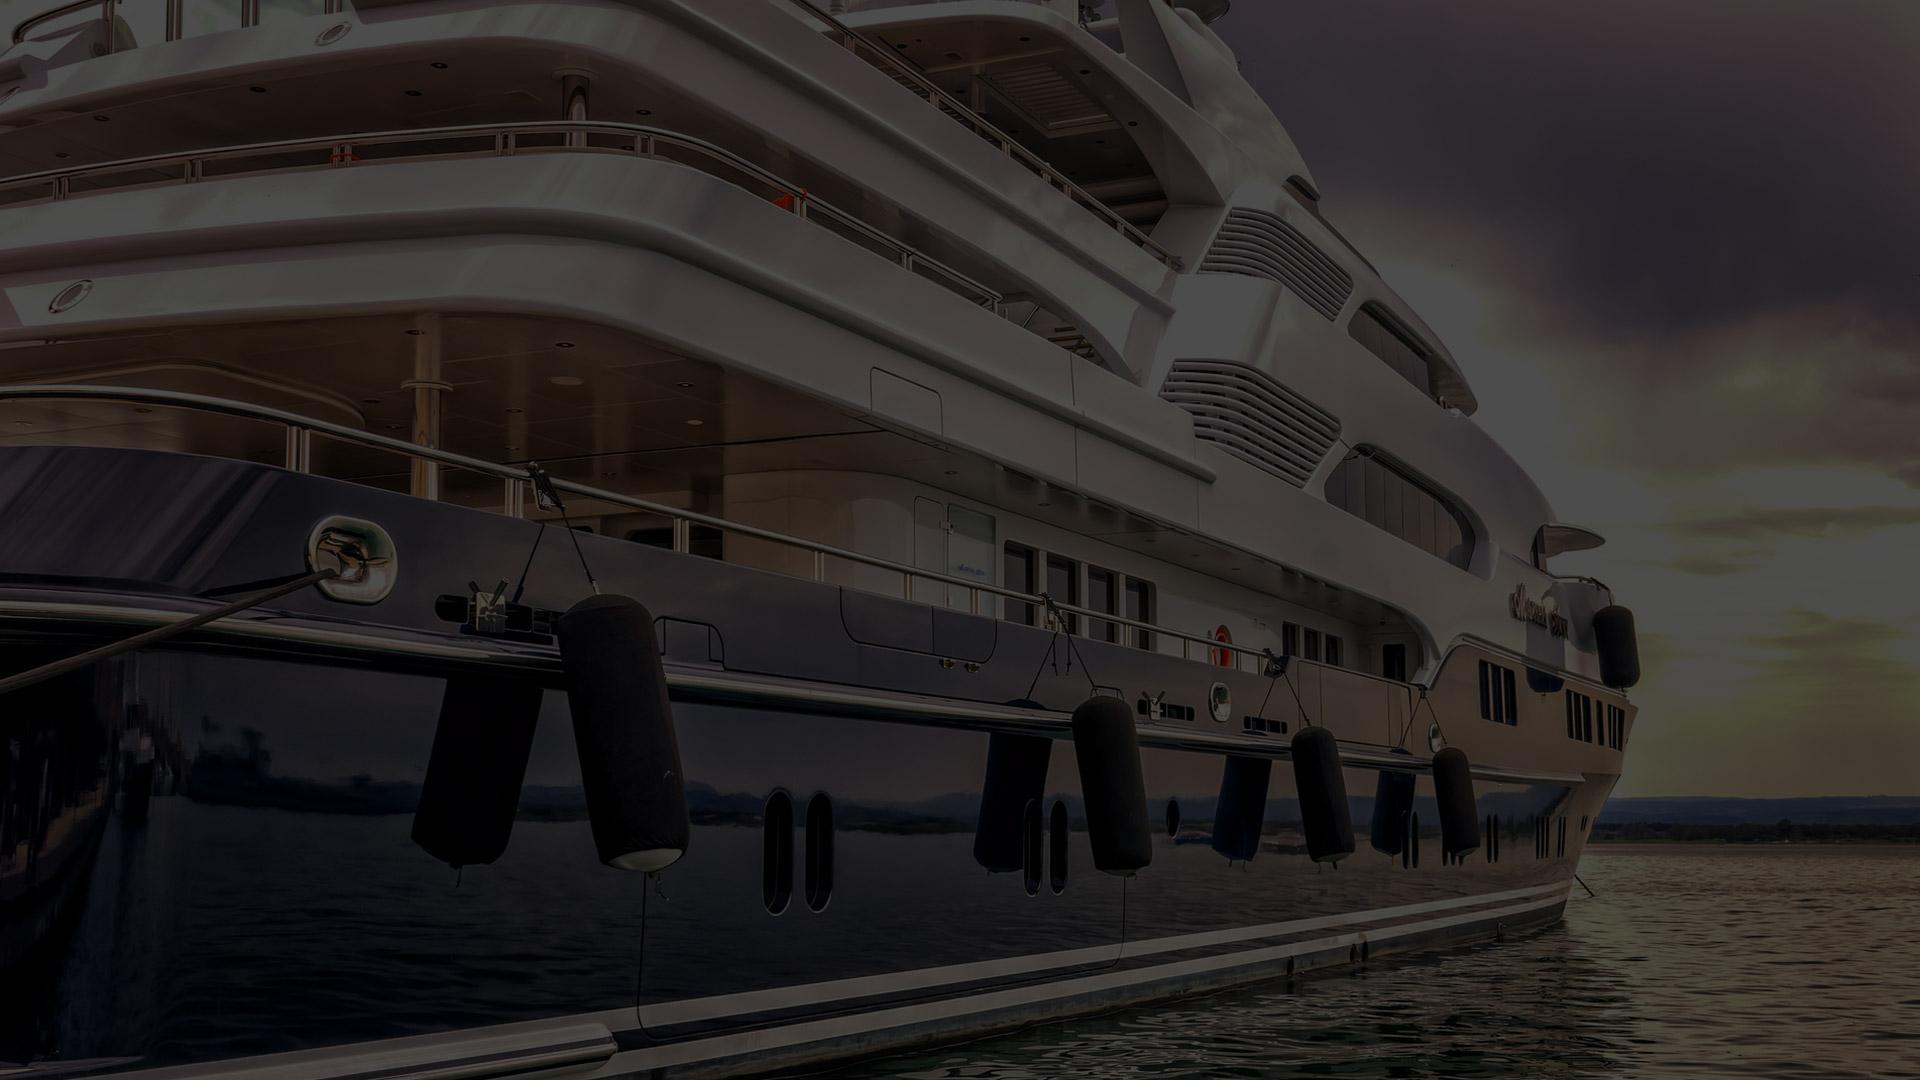 Superyacht from the side dark